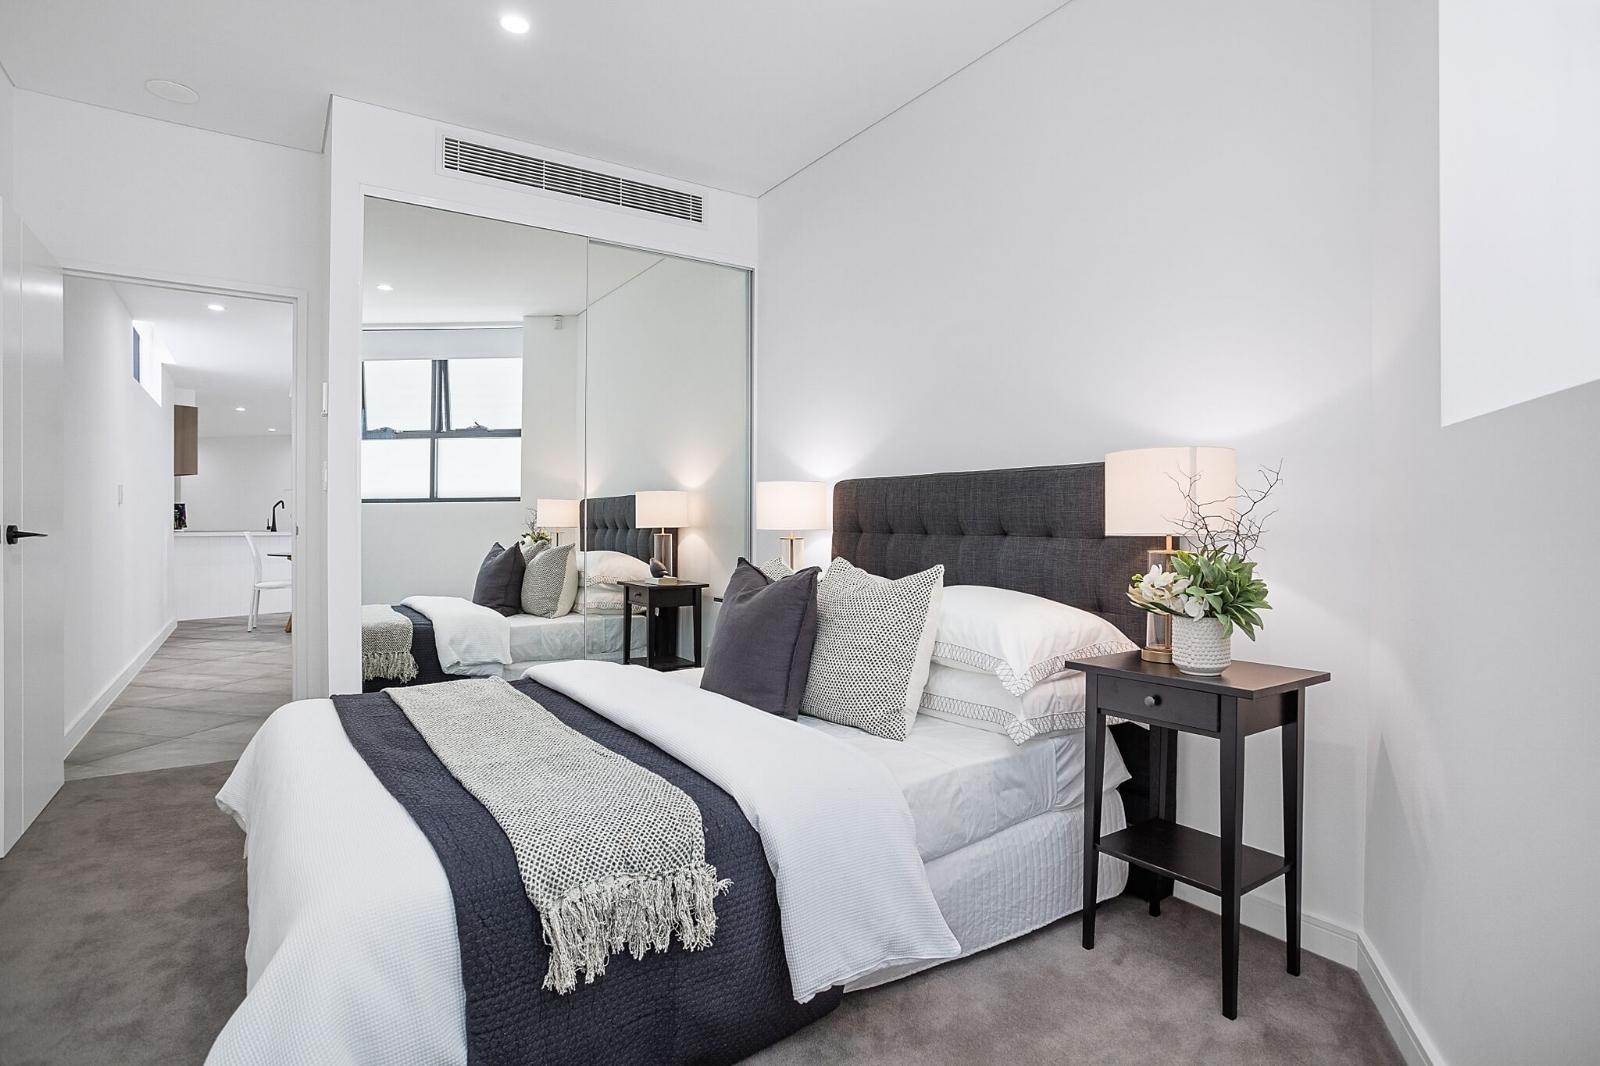 frazer_street_collaroy_bedroom_lux_styling.jpeg